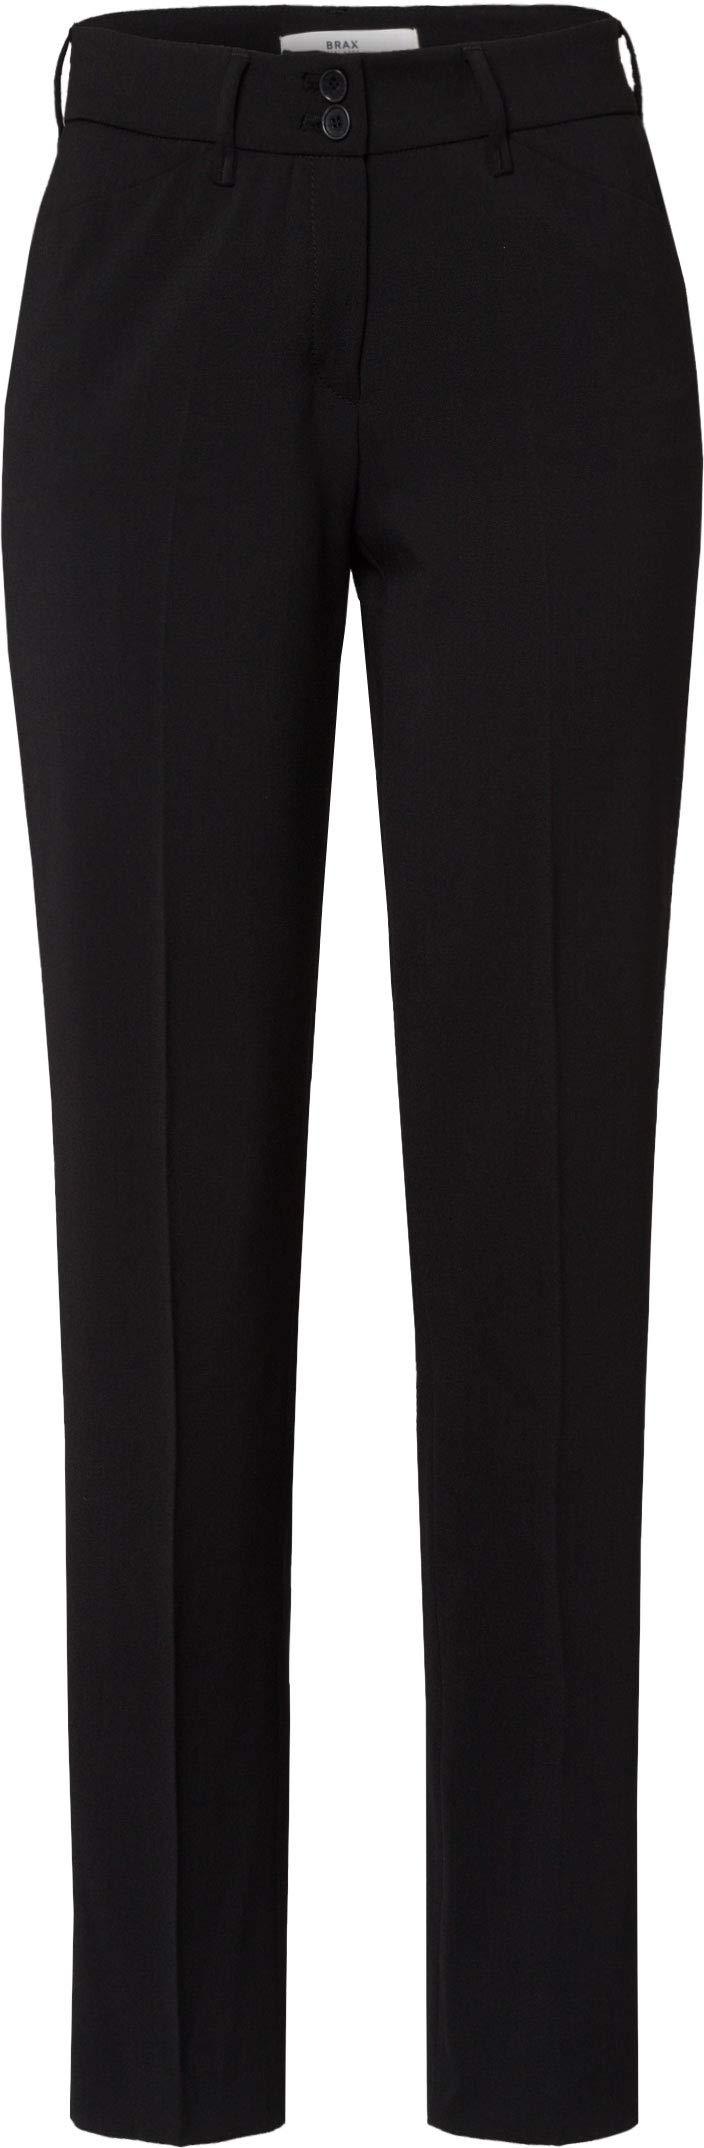 Brax 244taille Celine PantalonNoirblack Wool Flatfront Klassisch Clean Feminine Fit Fabricant42Femme rxoeWdCEQB